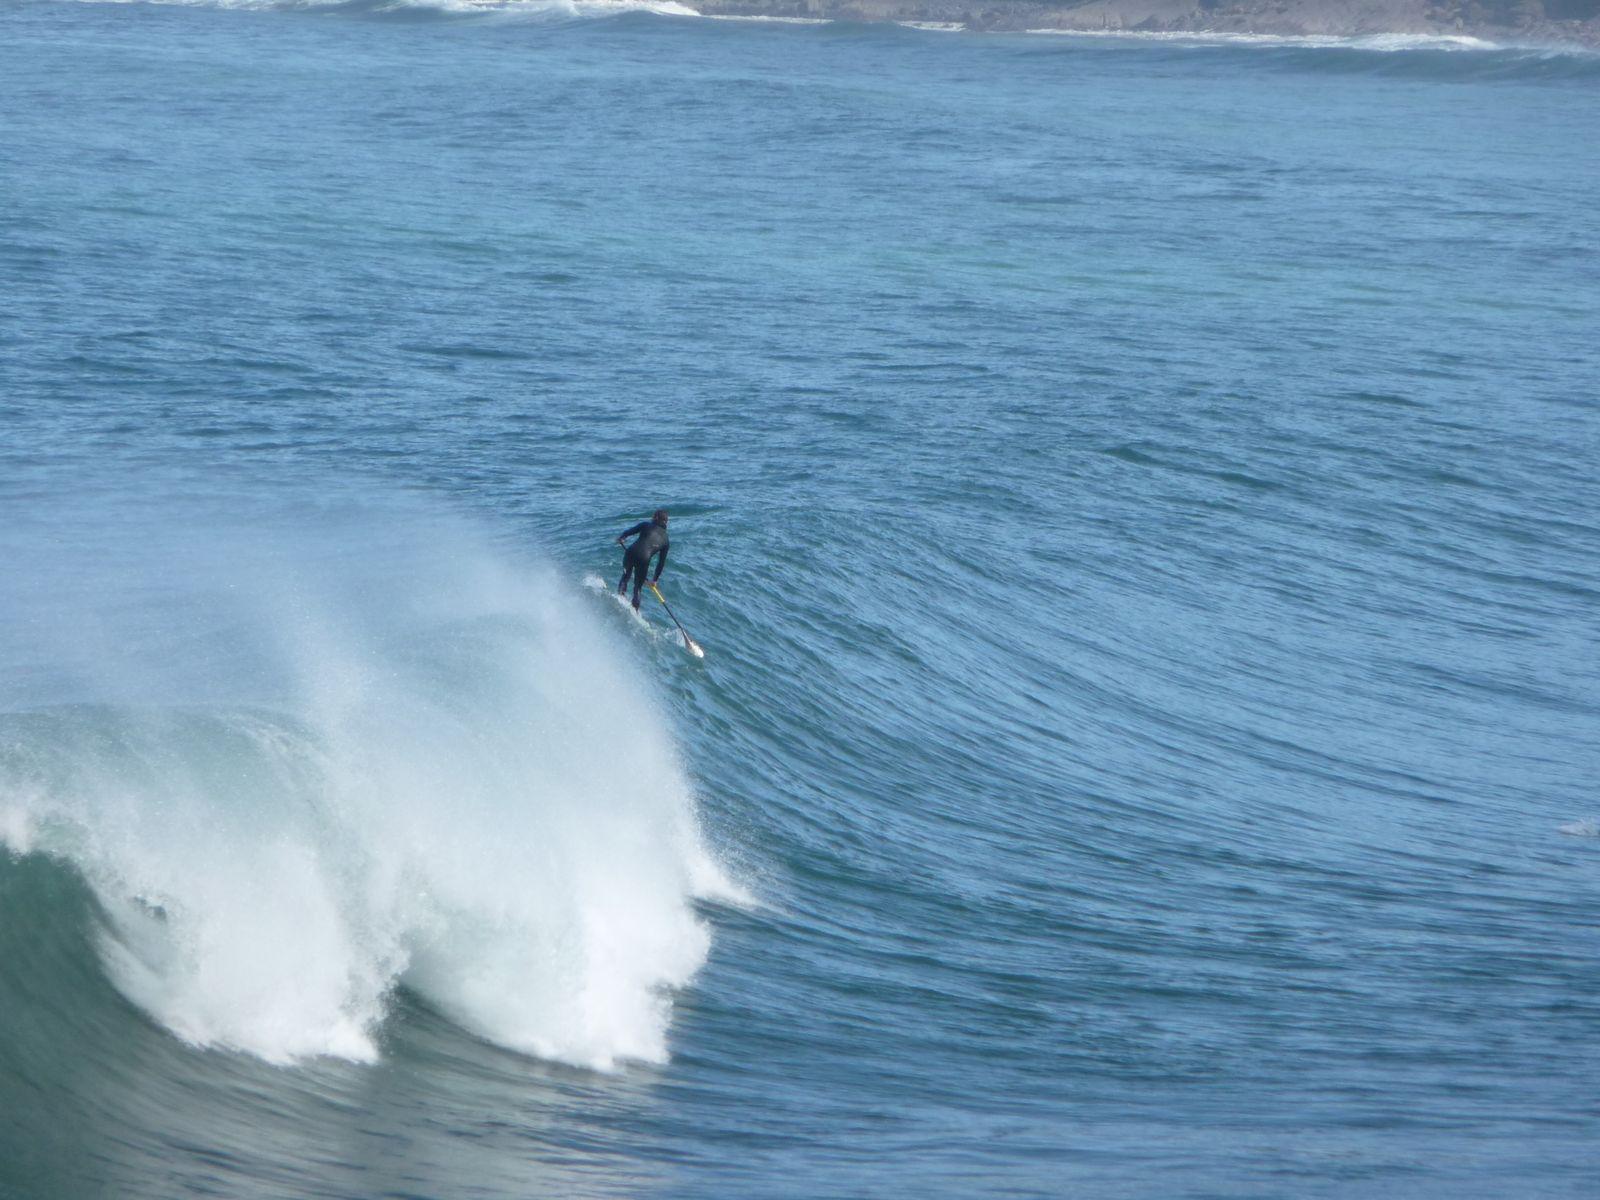 surf golf galea getxo bizkaia%2B%25289%2529